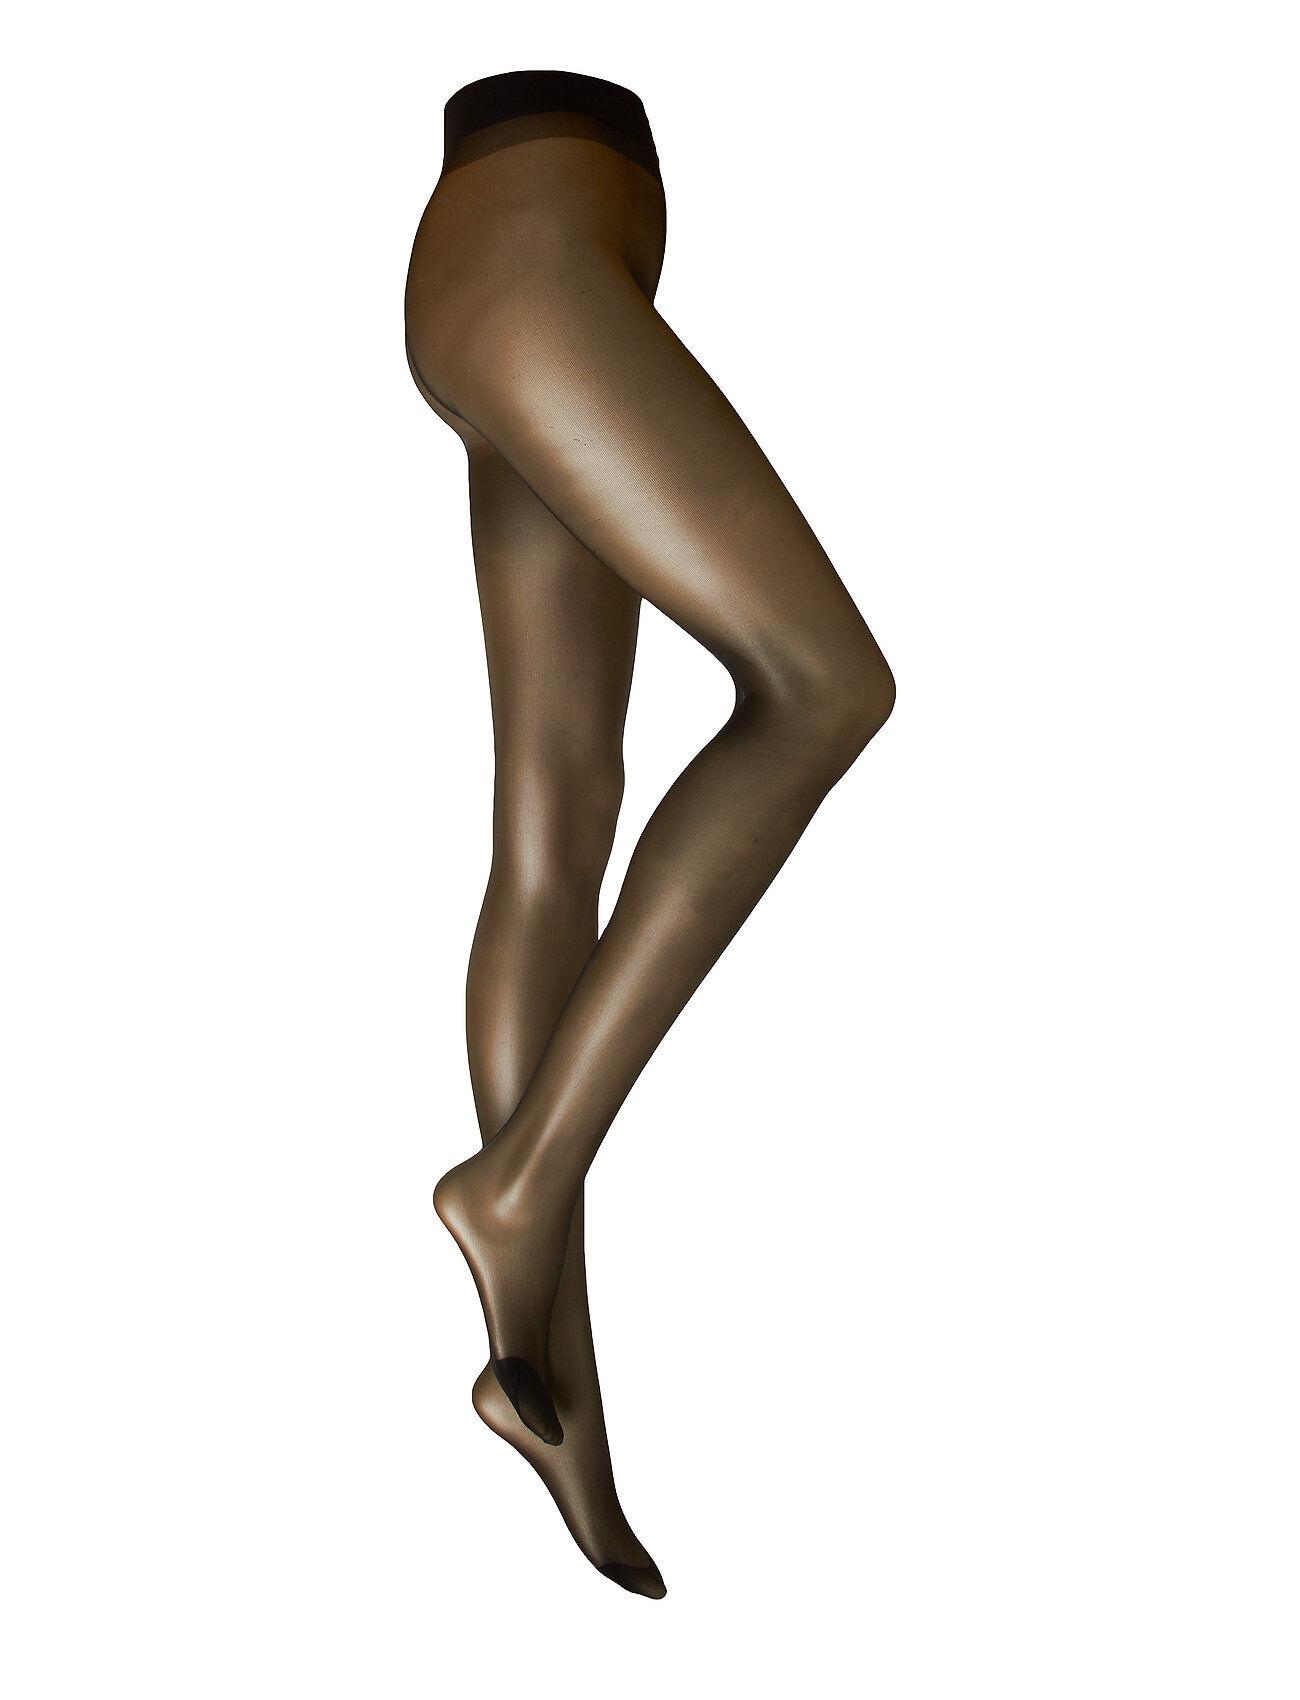 Swedish Stockings Elin Premium Tights 20d Sukkahousut Musta Swedish Stockings